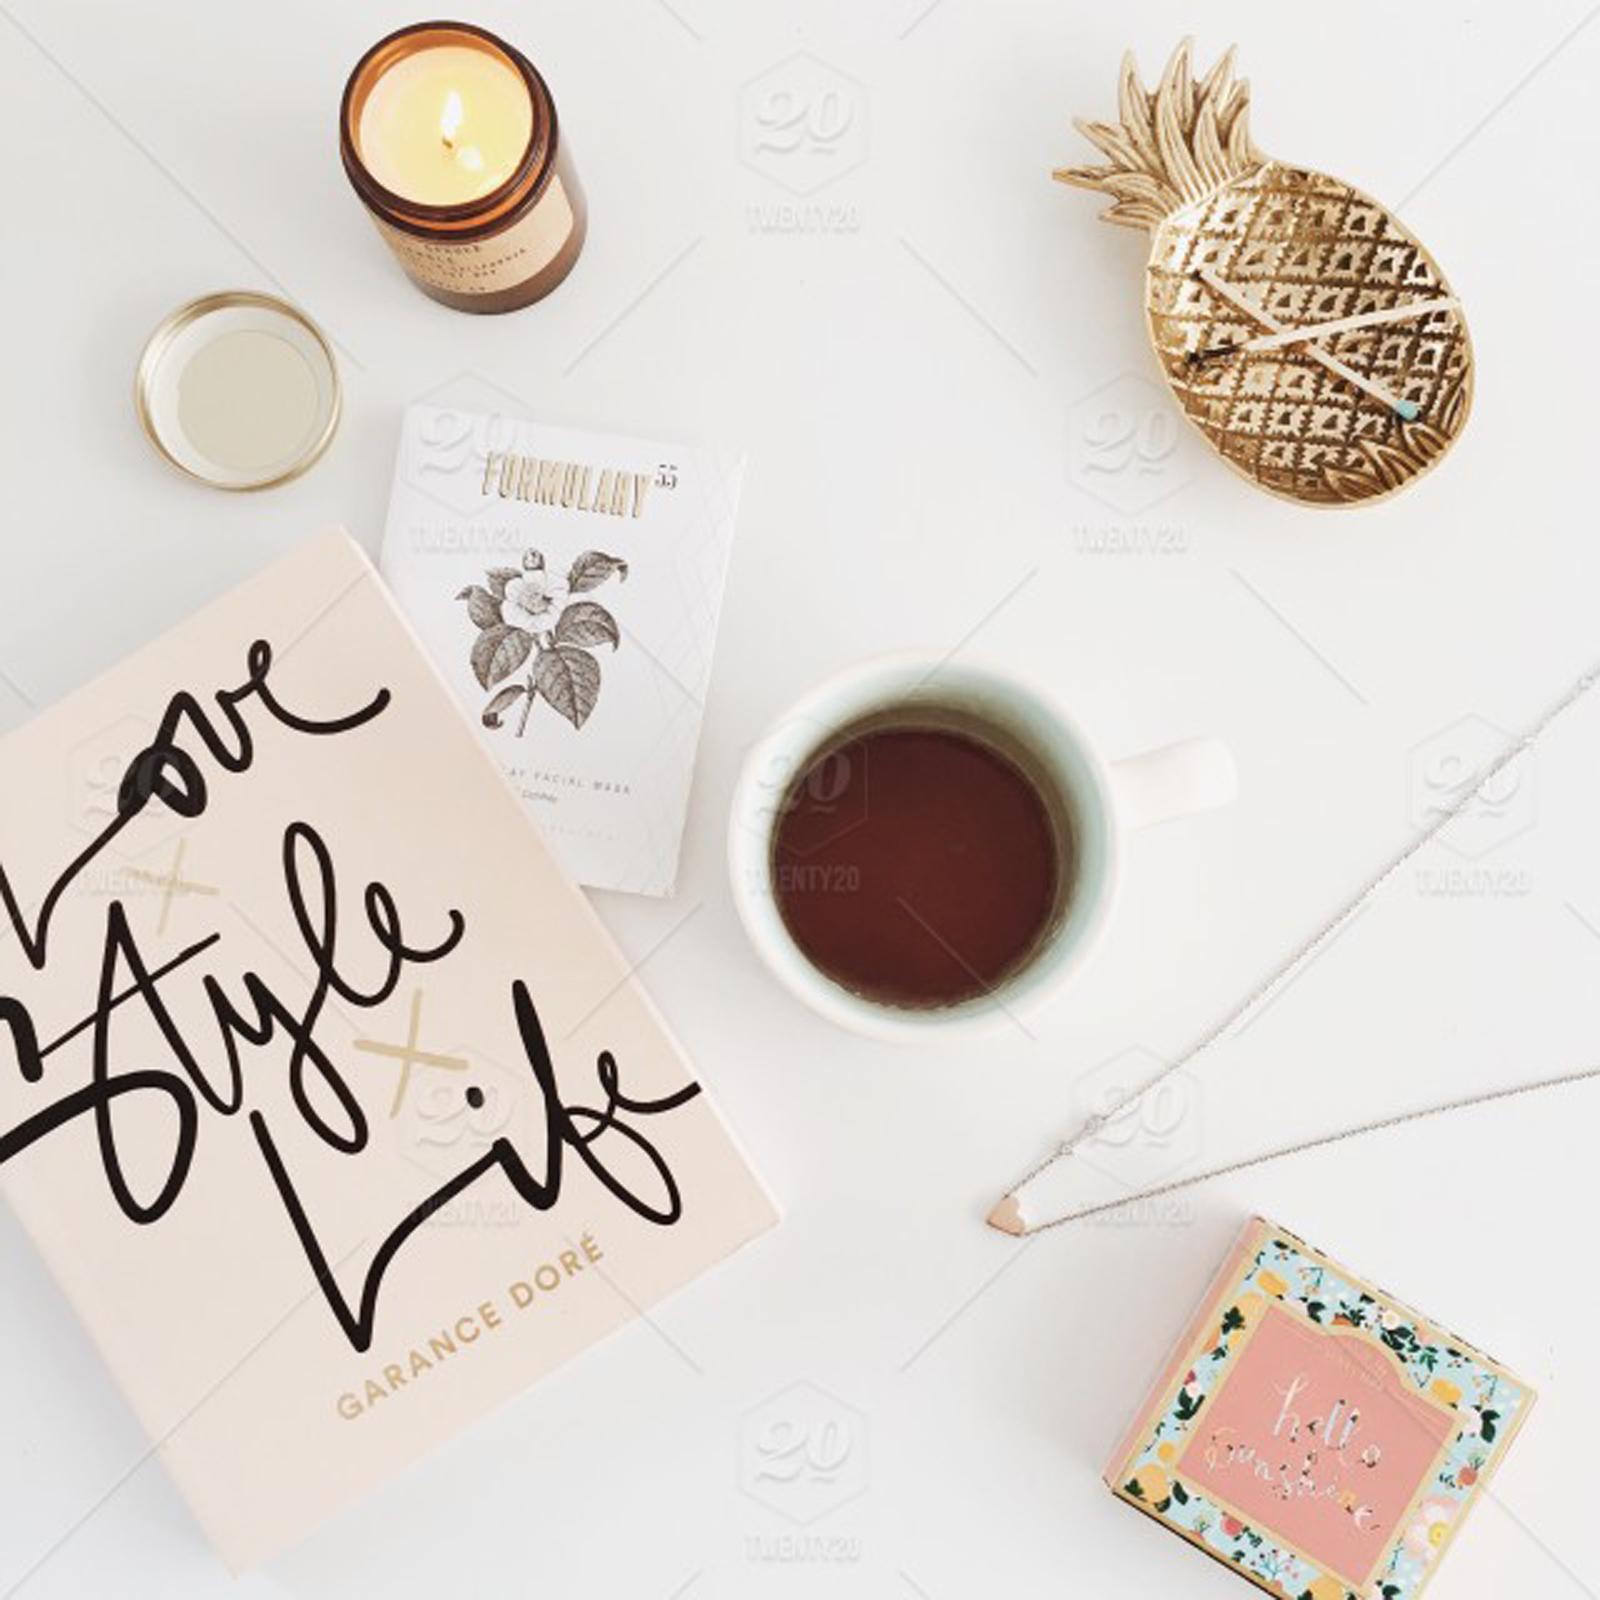 22222stock-photo-book-gold-fashion-table-lifestyle-flat-lay-hipster-items-648a7e6f-c0c4-4c74-82d9-3a8b4640edb3.jpg